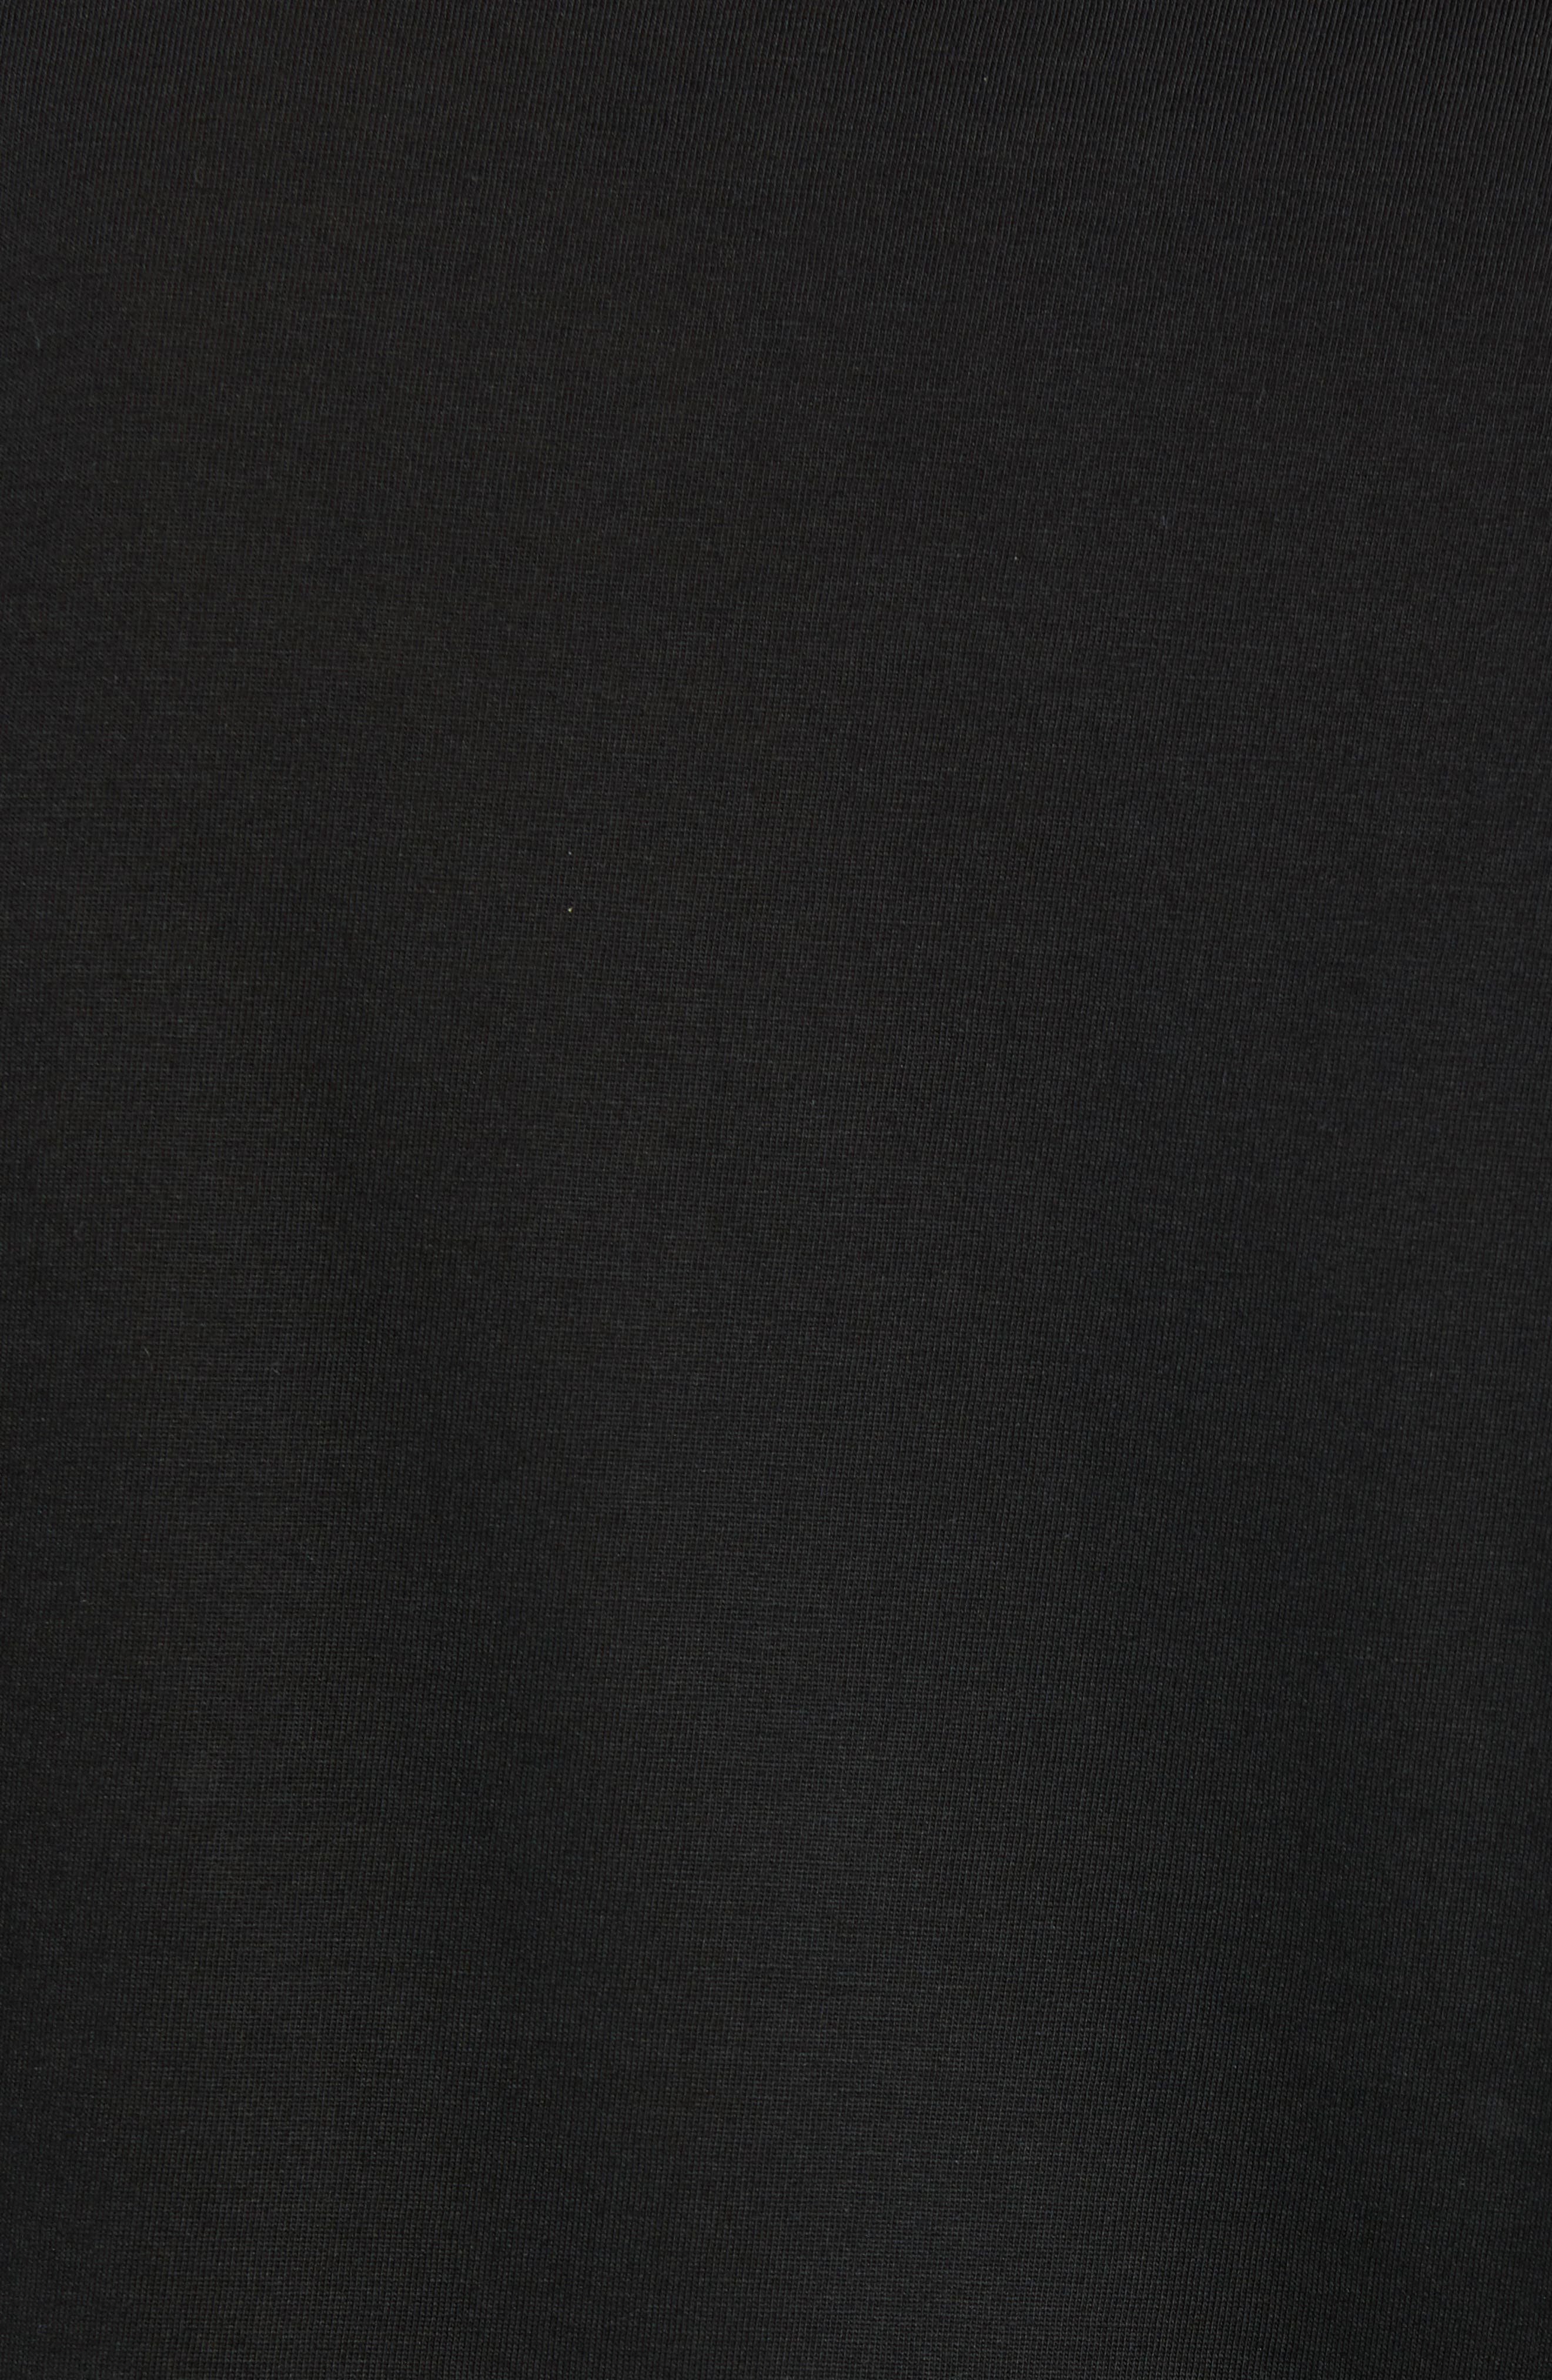 LACOSTE, Long Sleeve Pima Cotton T-Shirt, Alternate thumbnail 5, color, BLACK